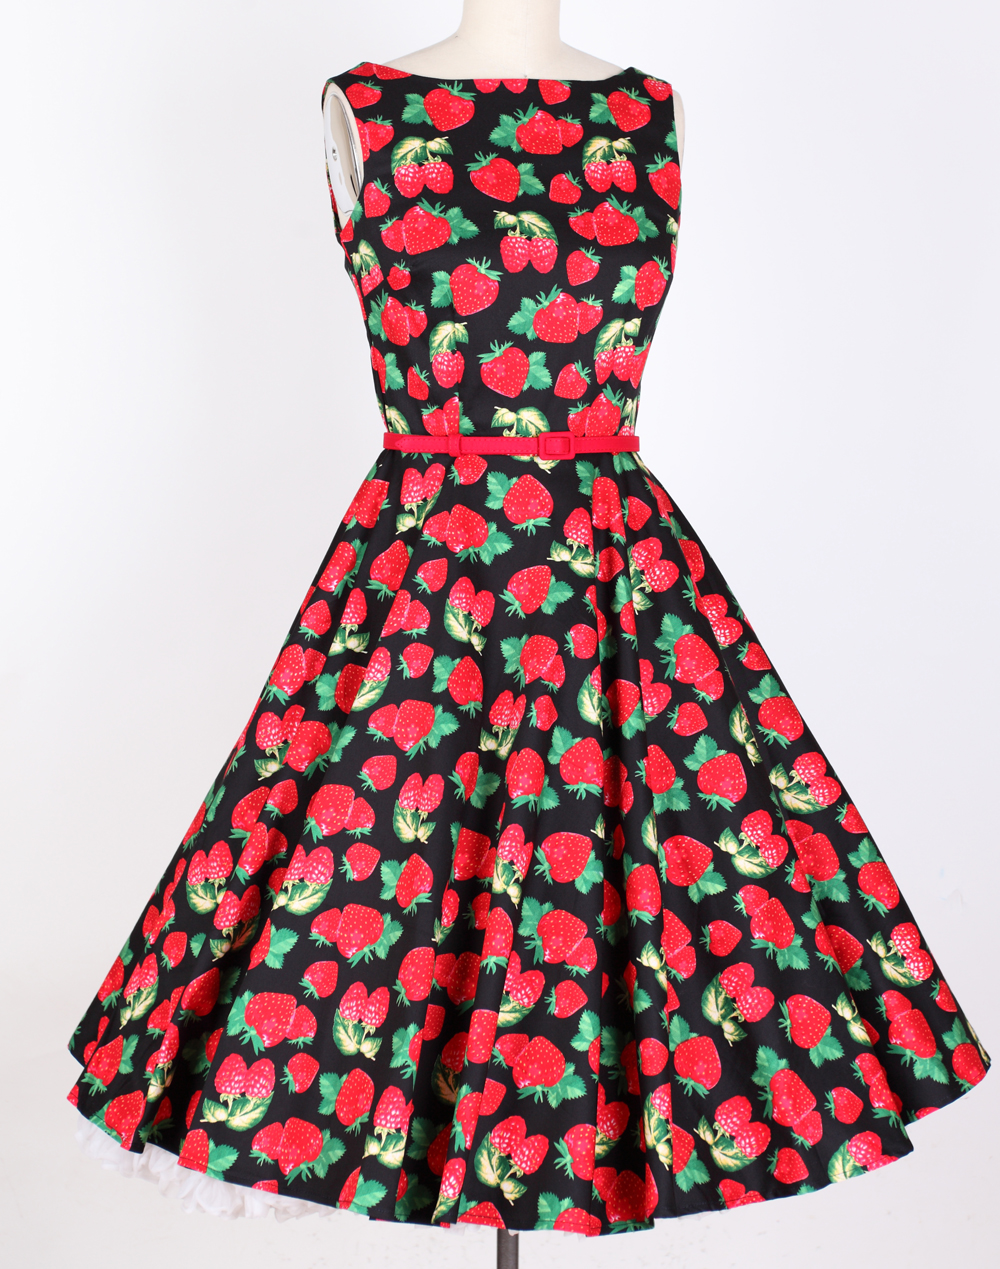 1950's Strawberry Dress